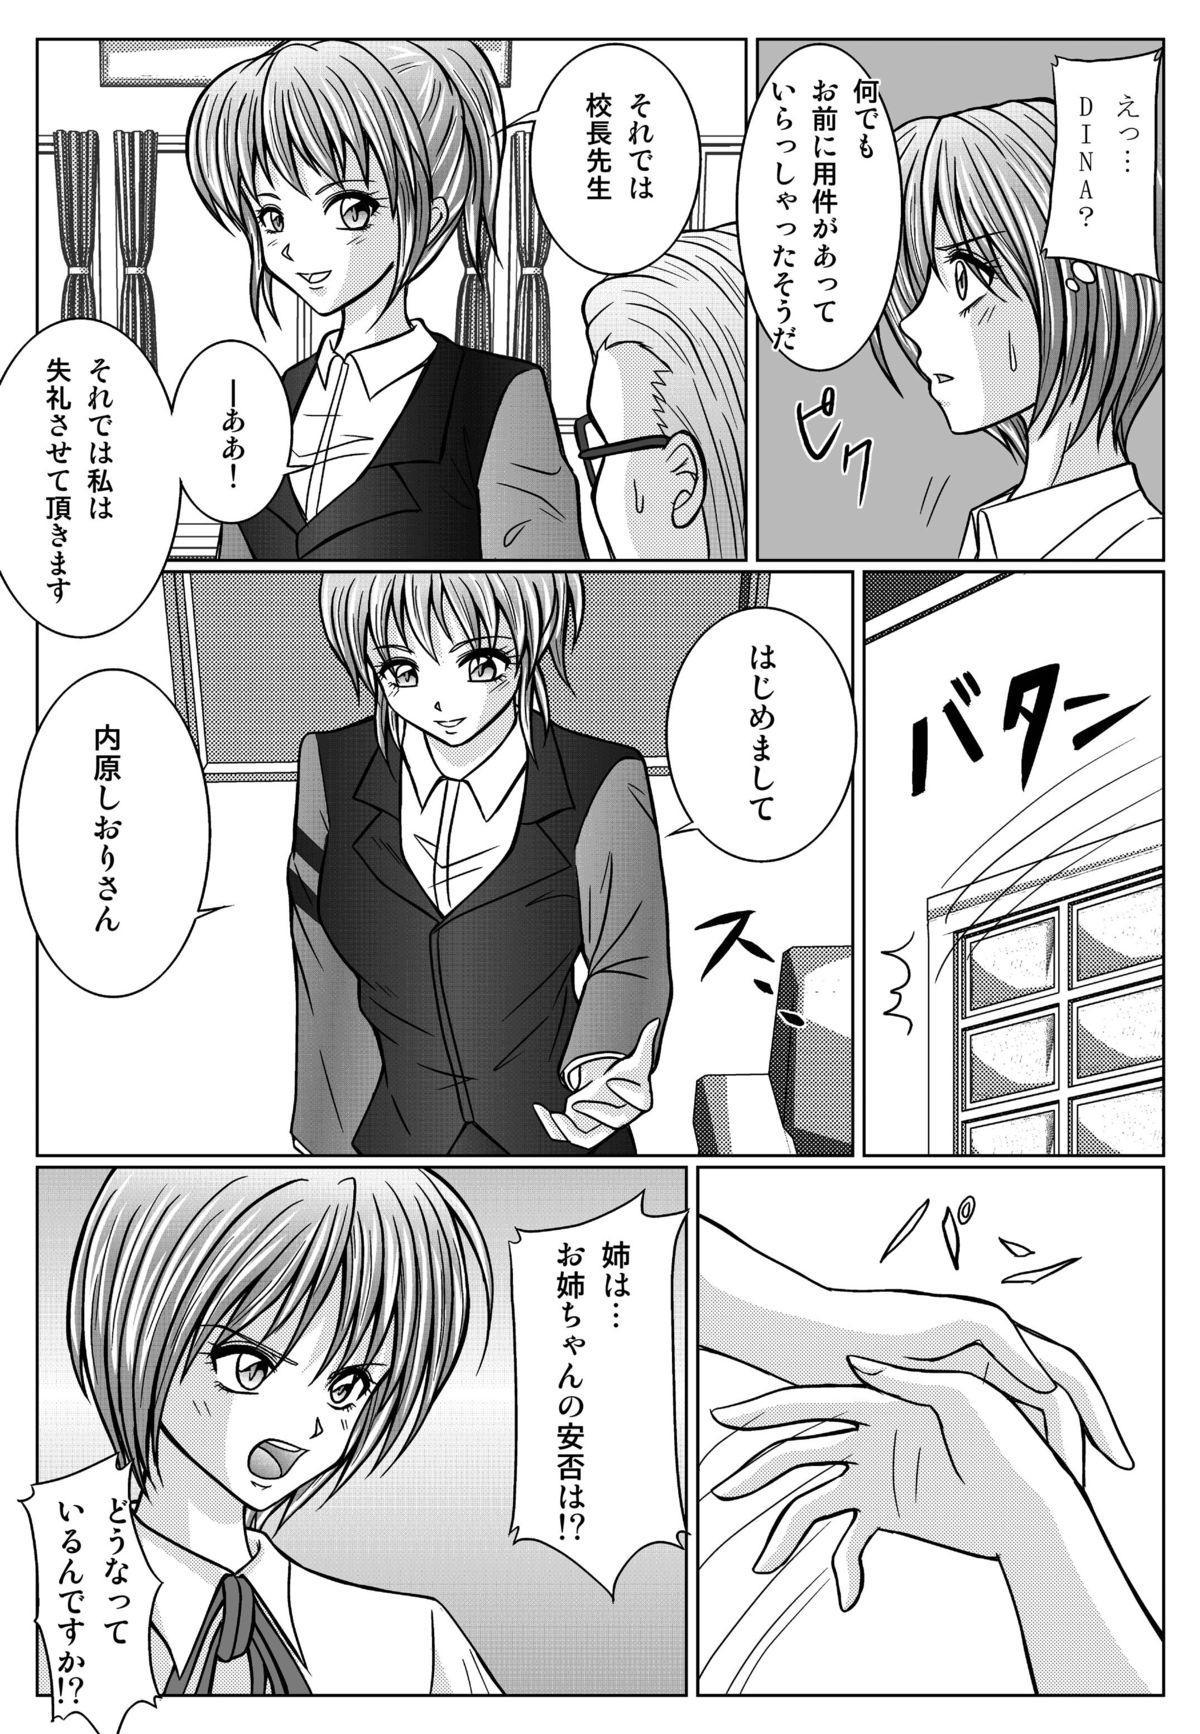 [Macxe's (monmon)] Tokubousentai Dinaranger ~Heroine Kairaku Sennou Keikaku~ Vol.01/02/03 (Renkaban) [Digital] 76